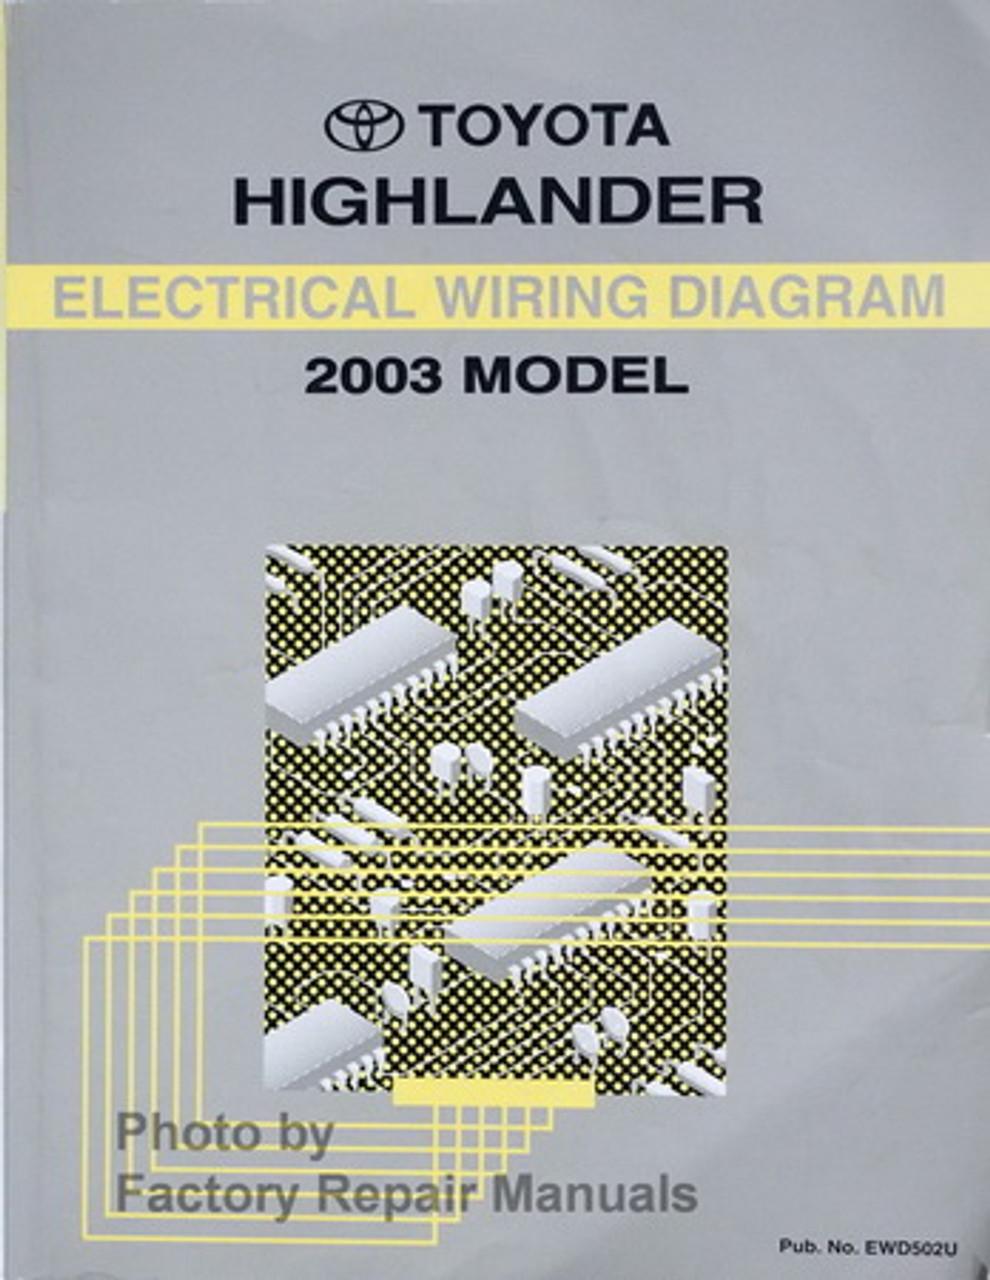 2003 Toyota Highlander Electrical Wiring Diagrams Original on